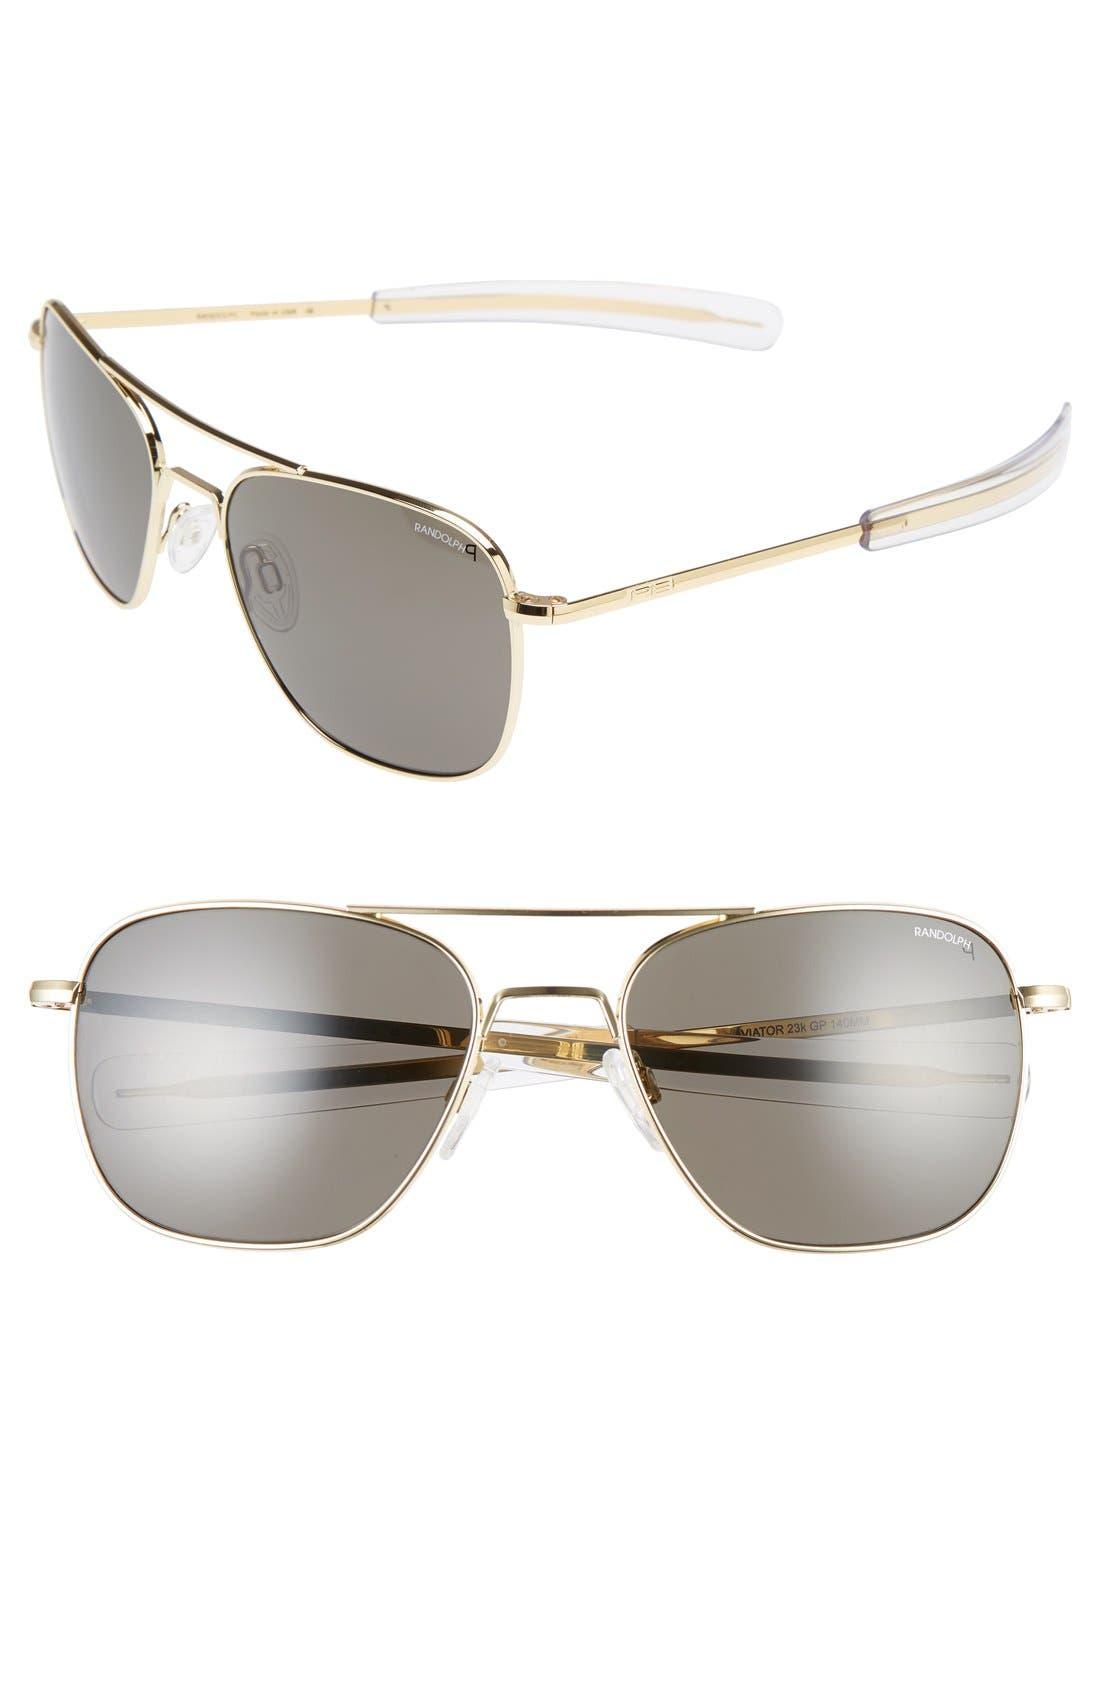 58mm Polarized Aviator Sunglasses,                         Main,                         color, 23 K Gold